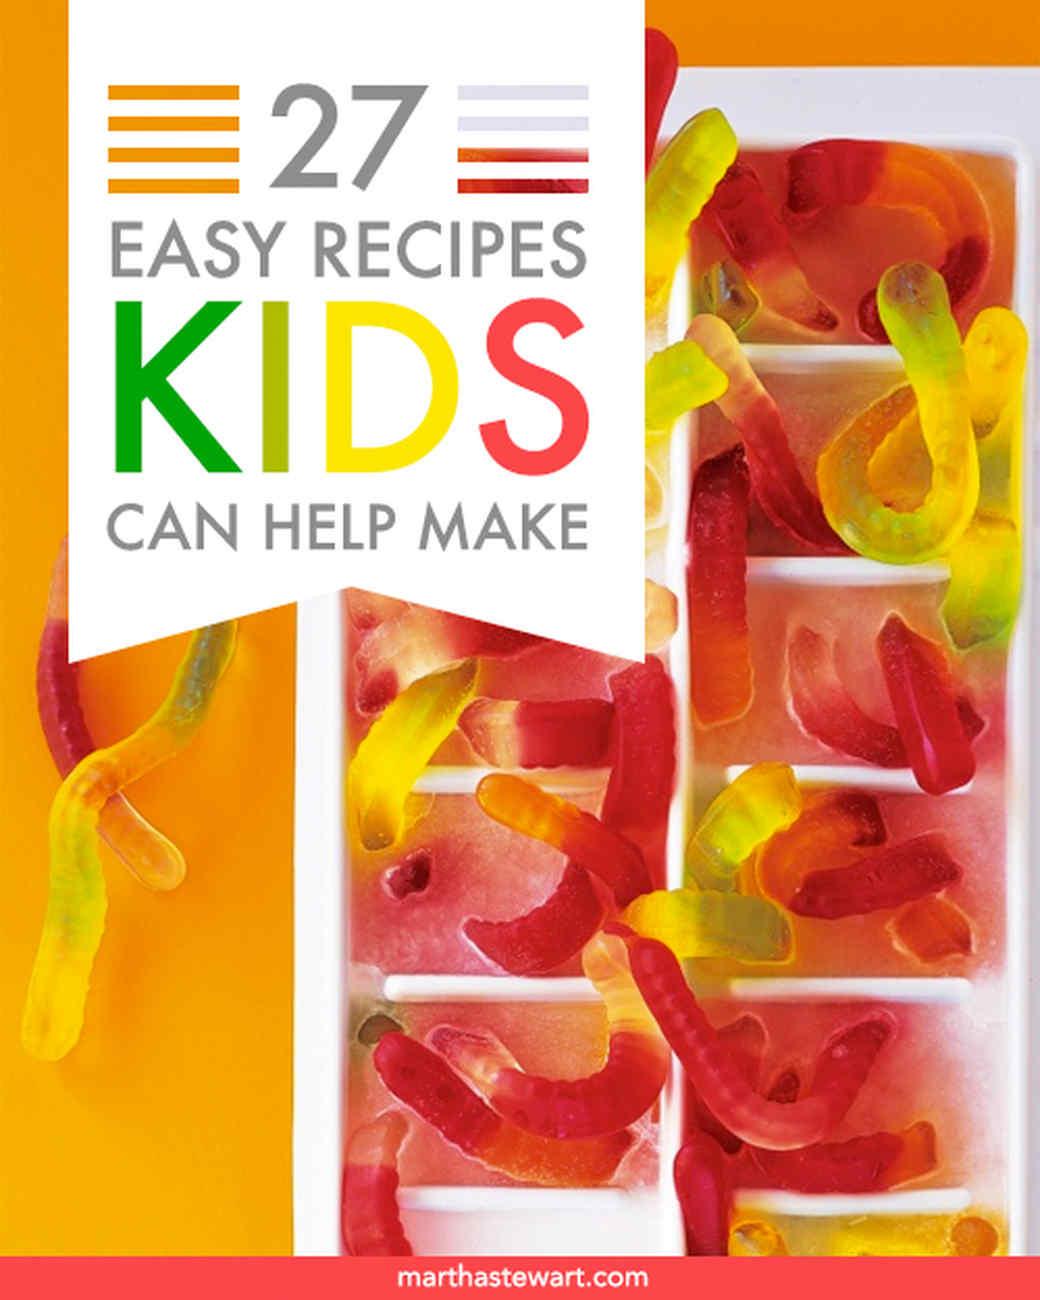 27-easy-recipes-kids-can-make-0115.jpg